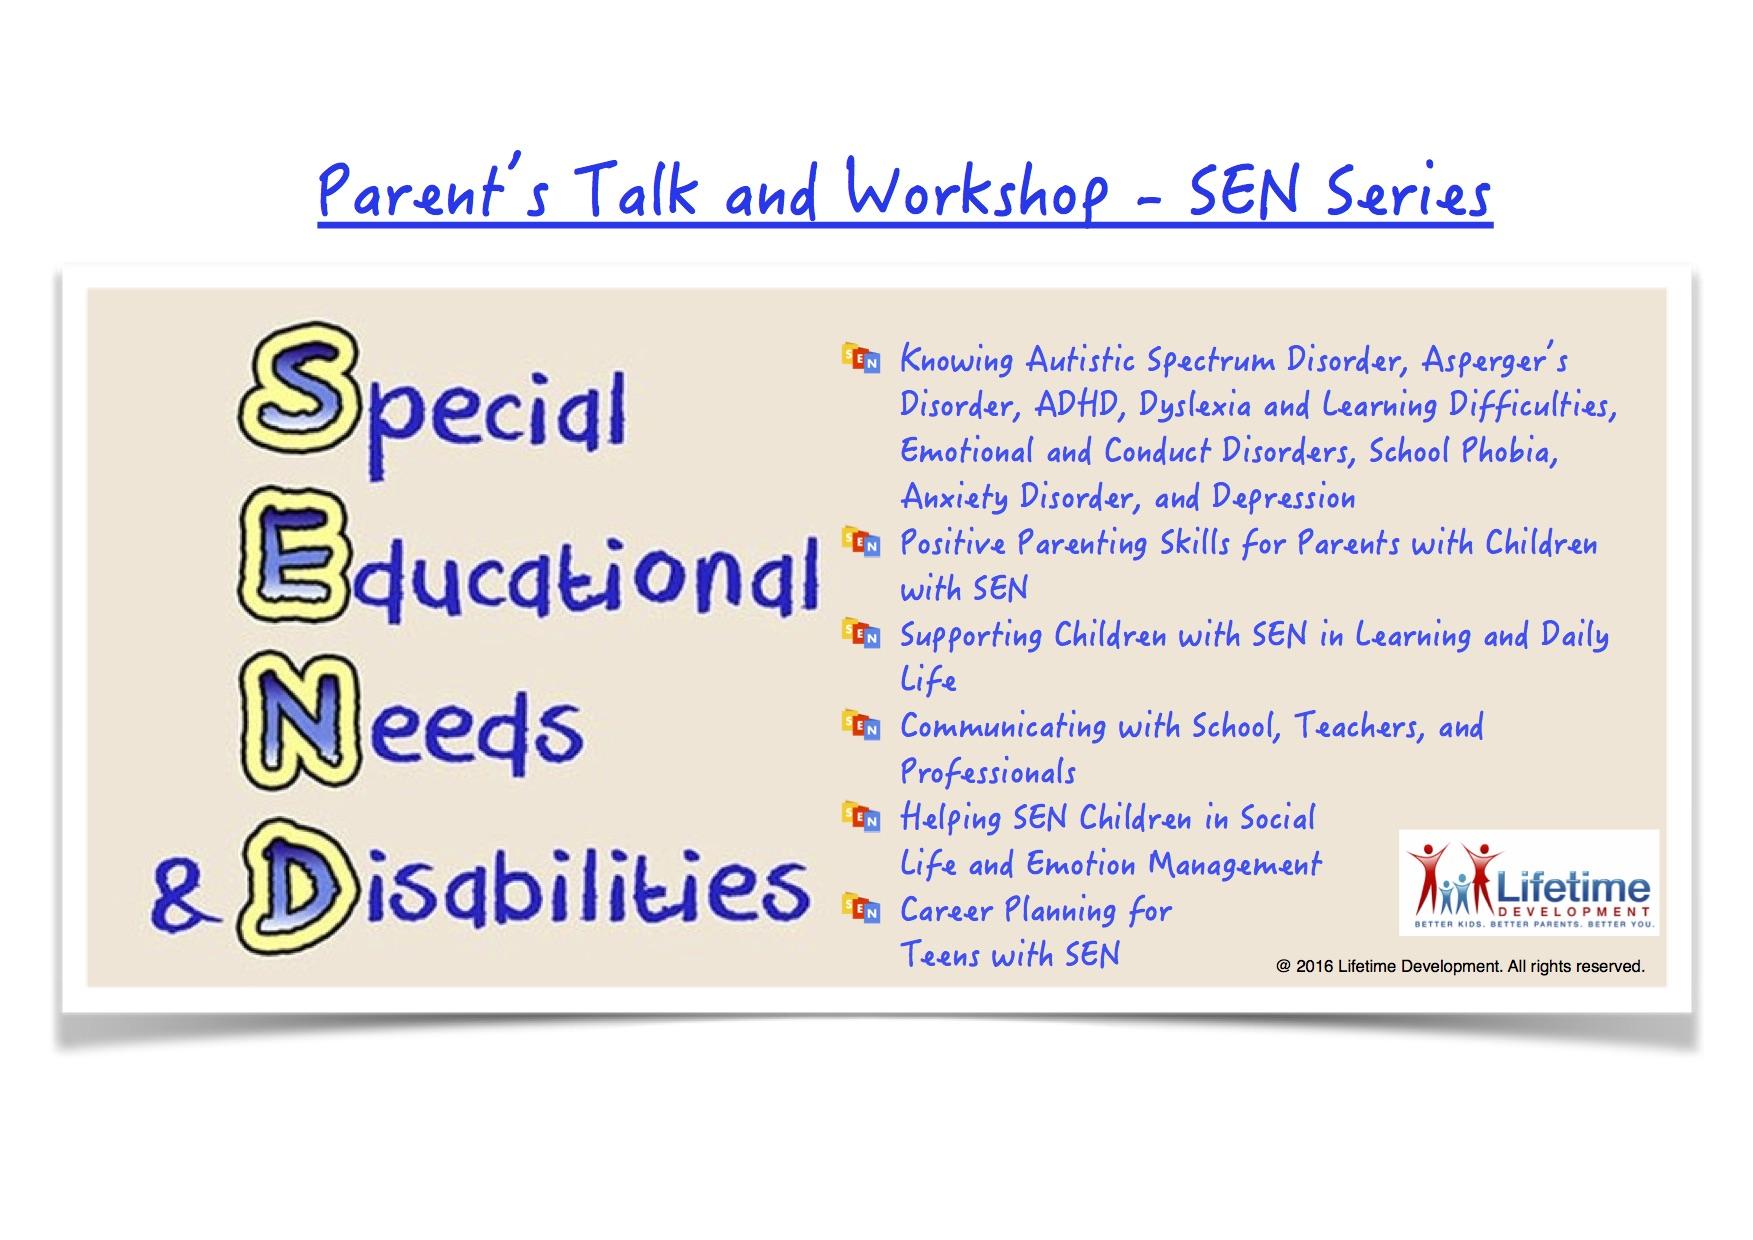 201607 Parent Talk and Workshop SEN Series English